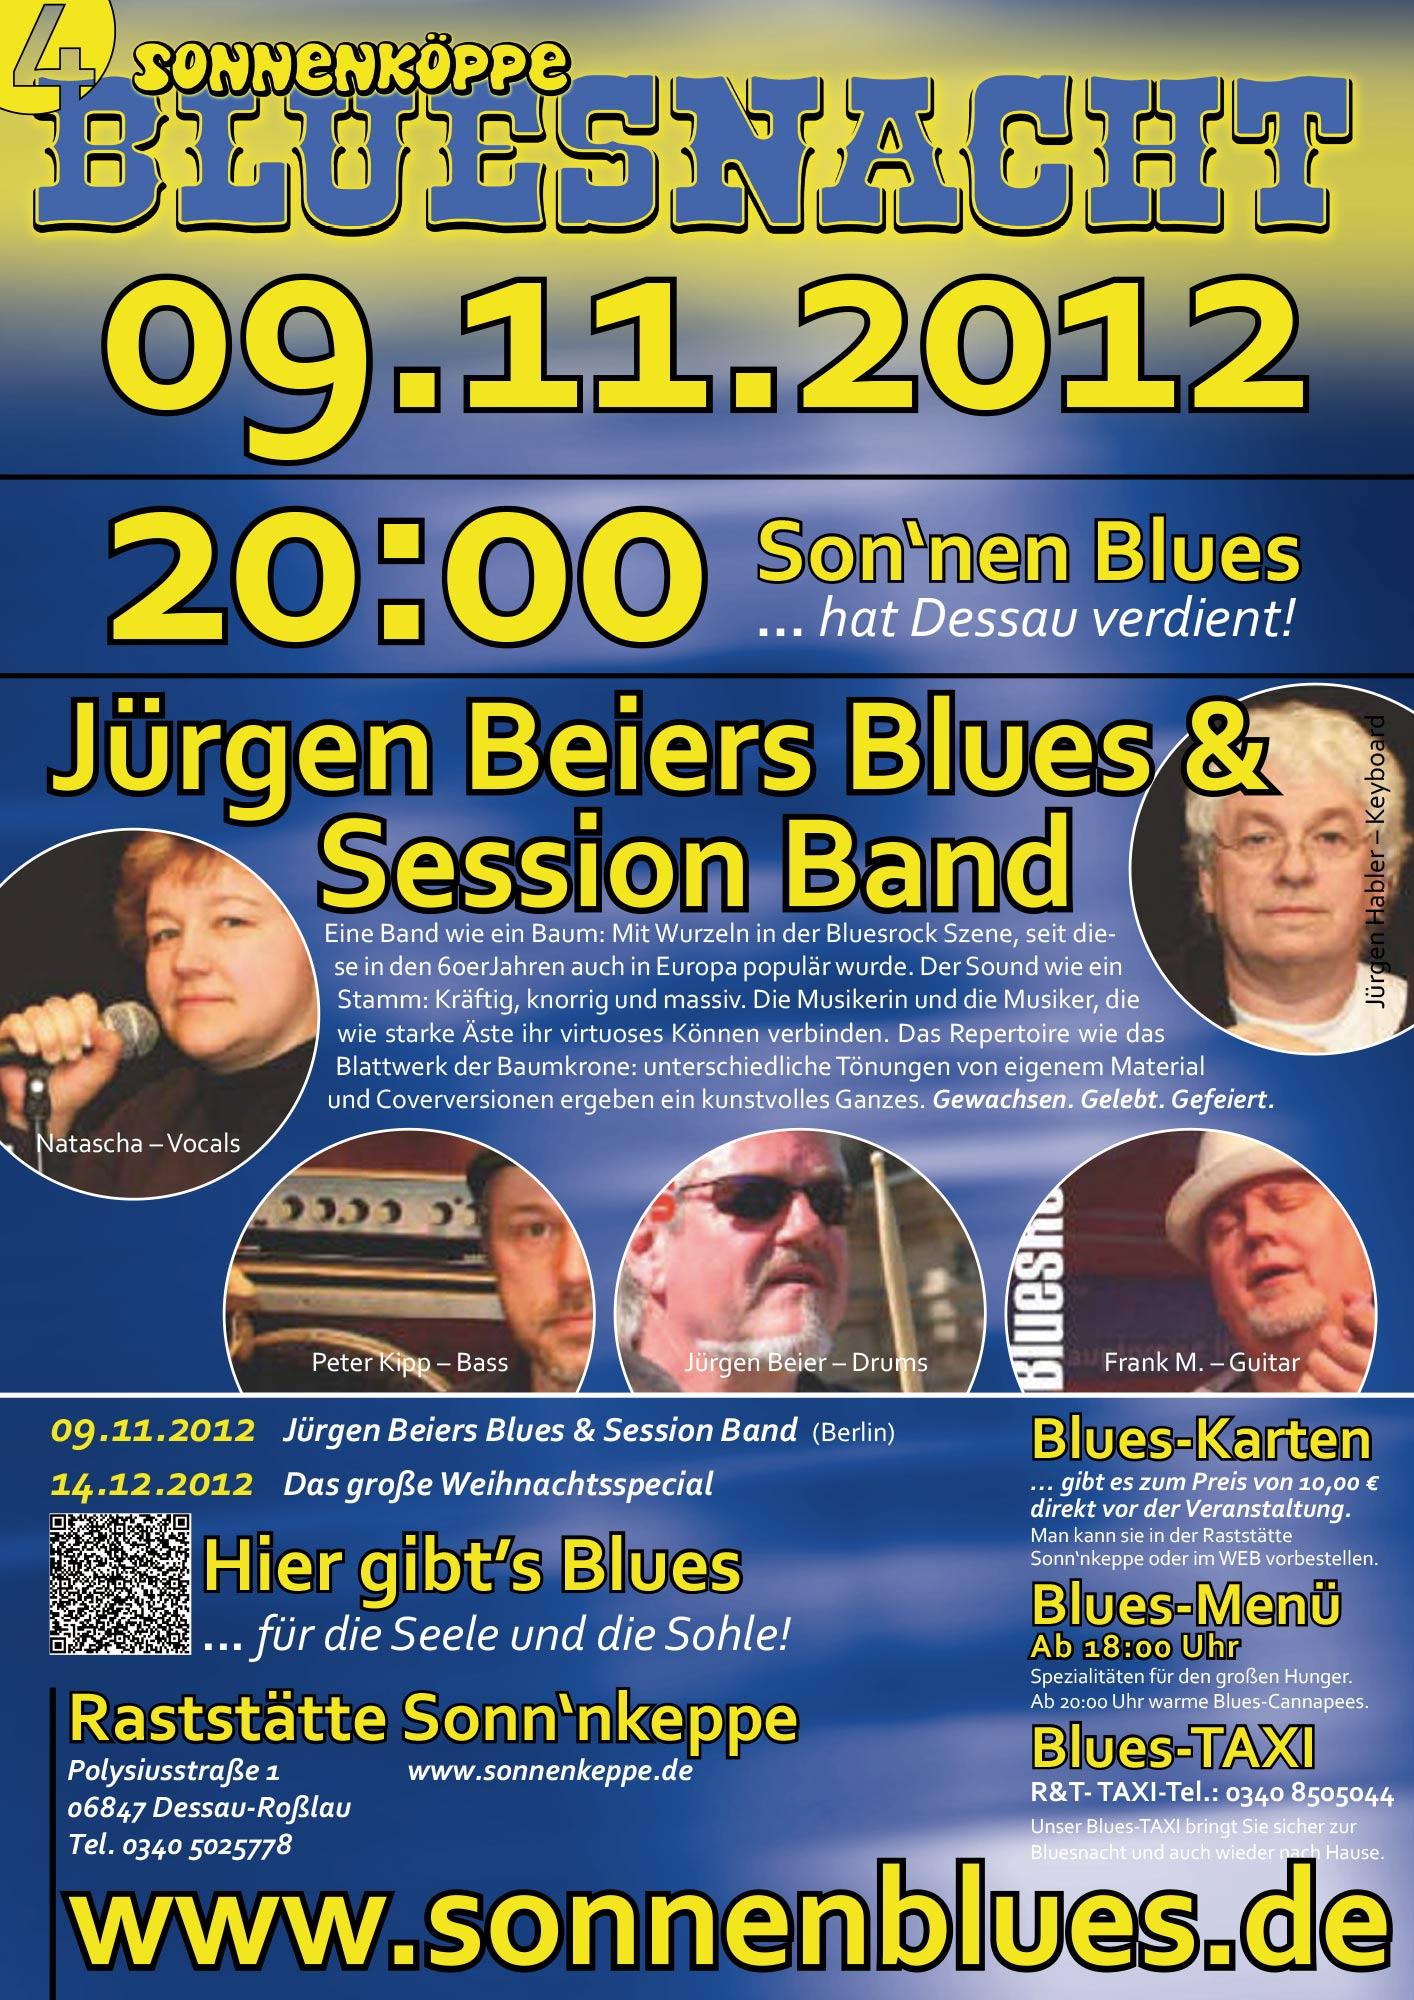 Bluesnacht #5 - Jürgen Beier Blues & Session Band